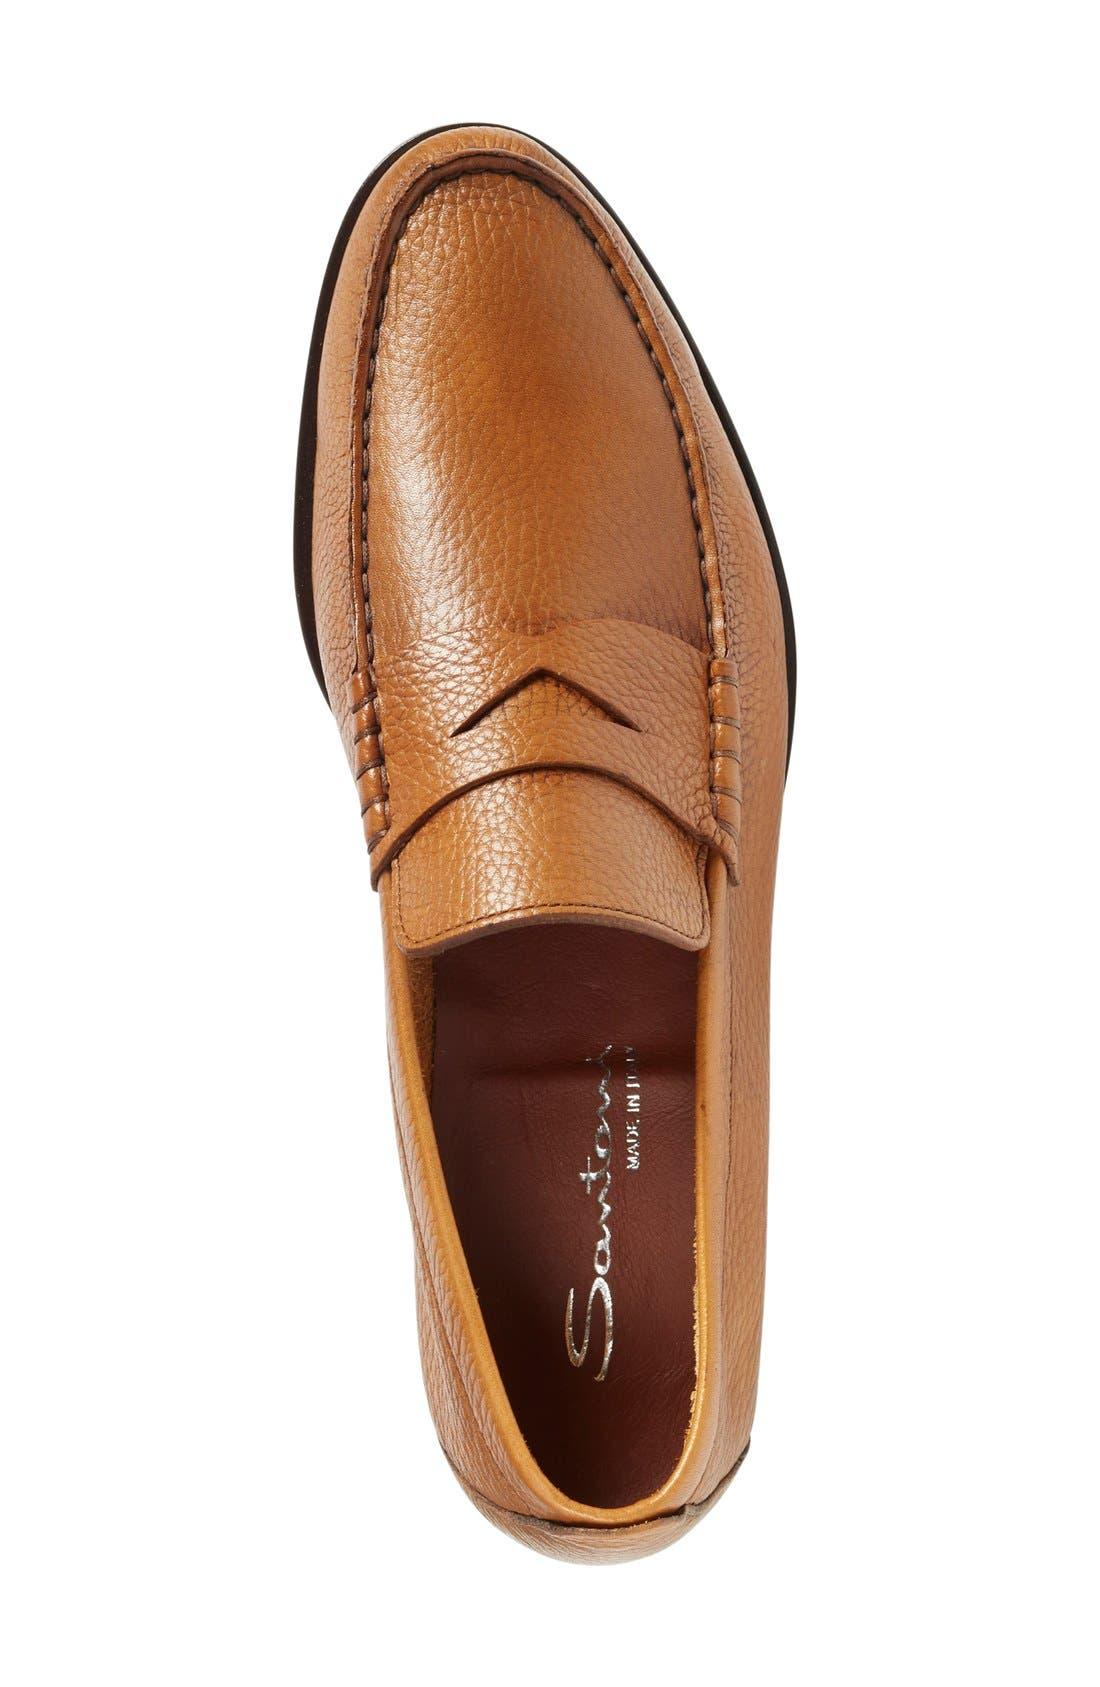 'Carmel' Penny Loafer,                             Alternate thumbnail 3, color,                             Tan Leather